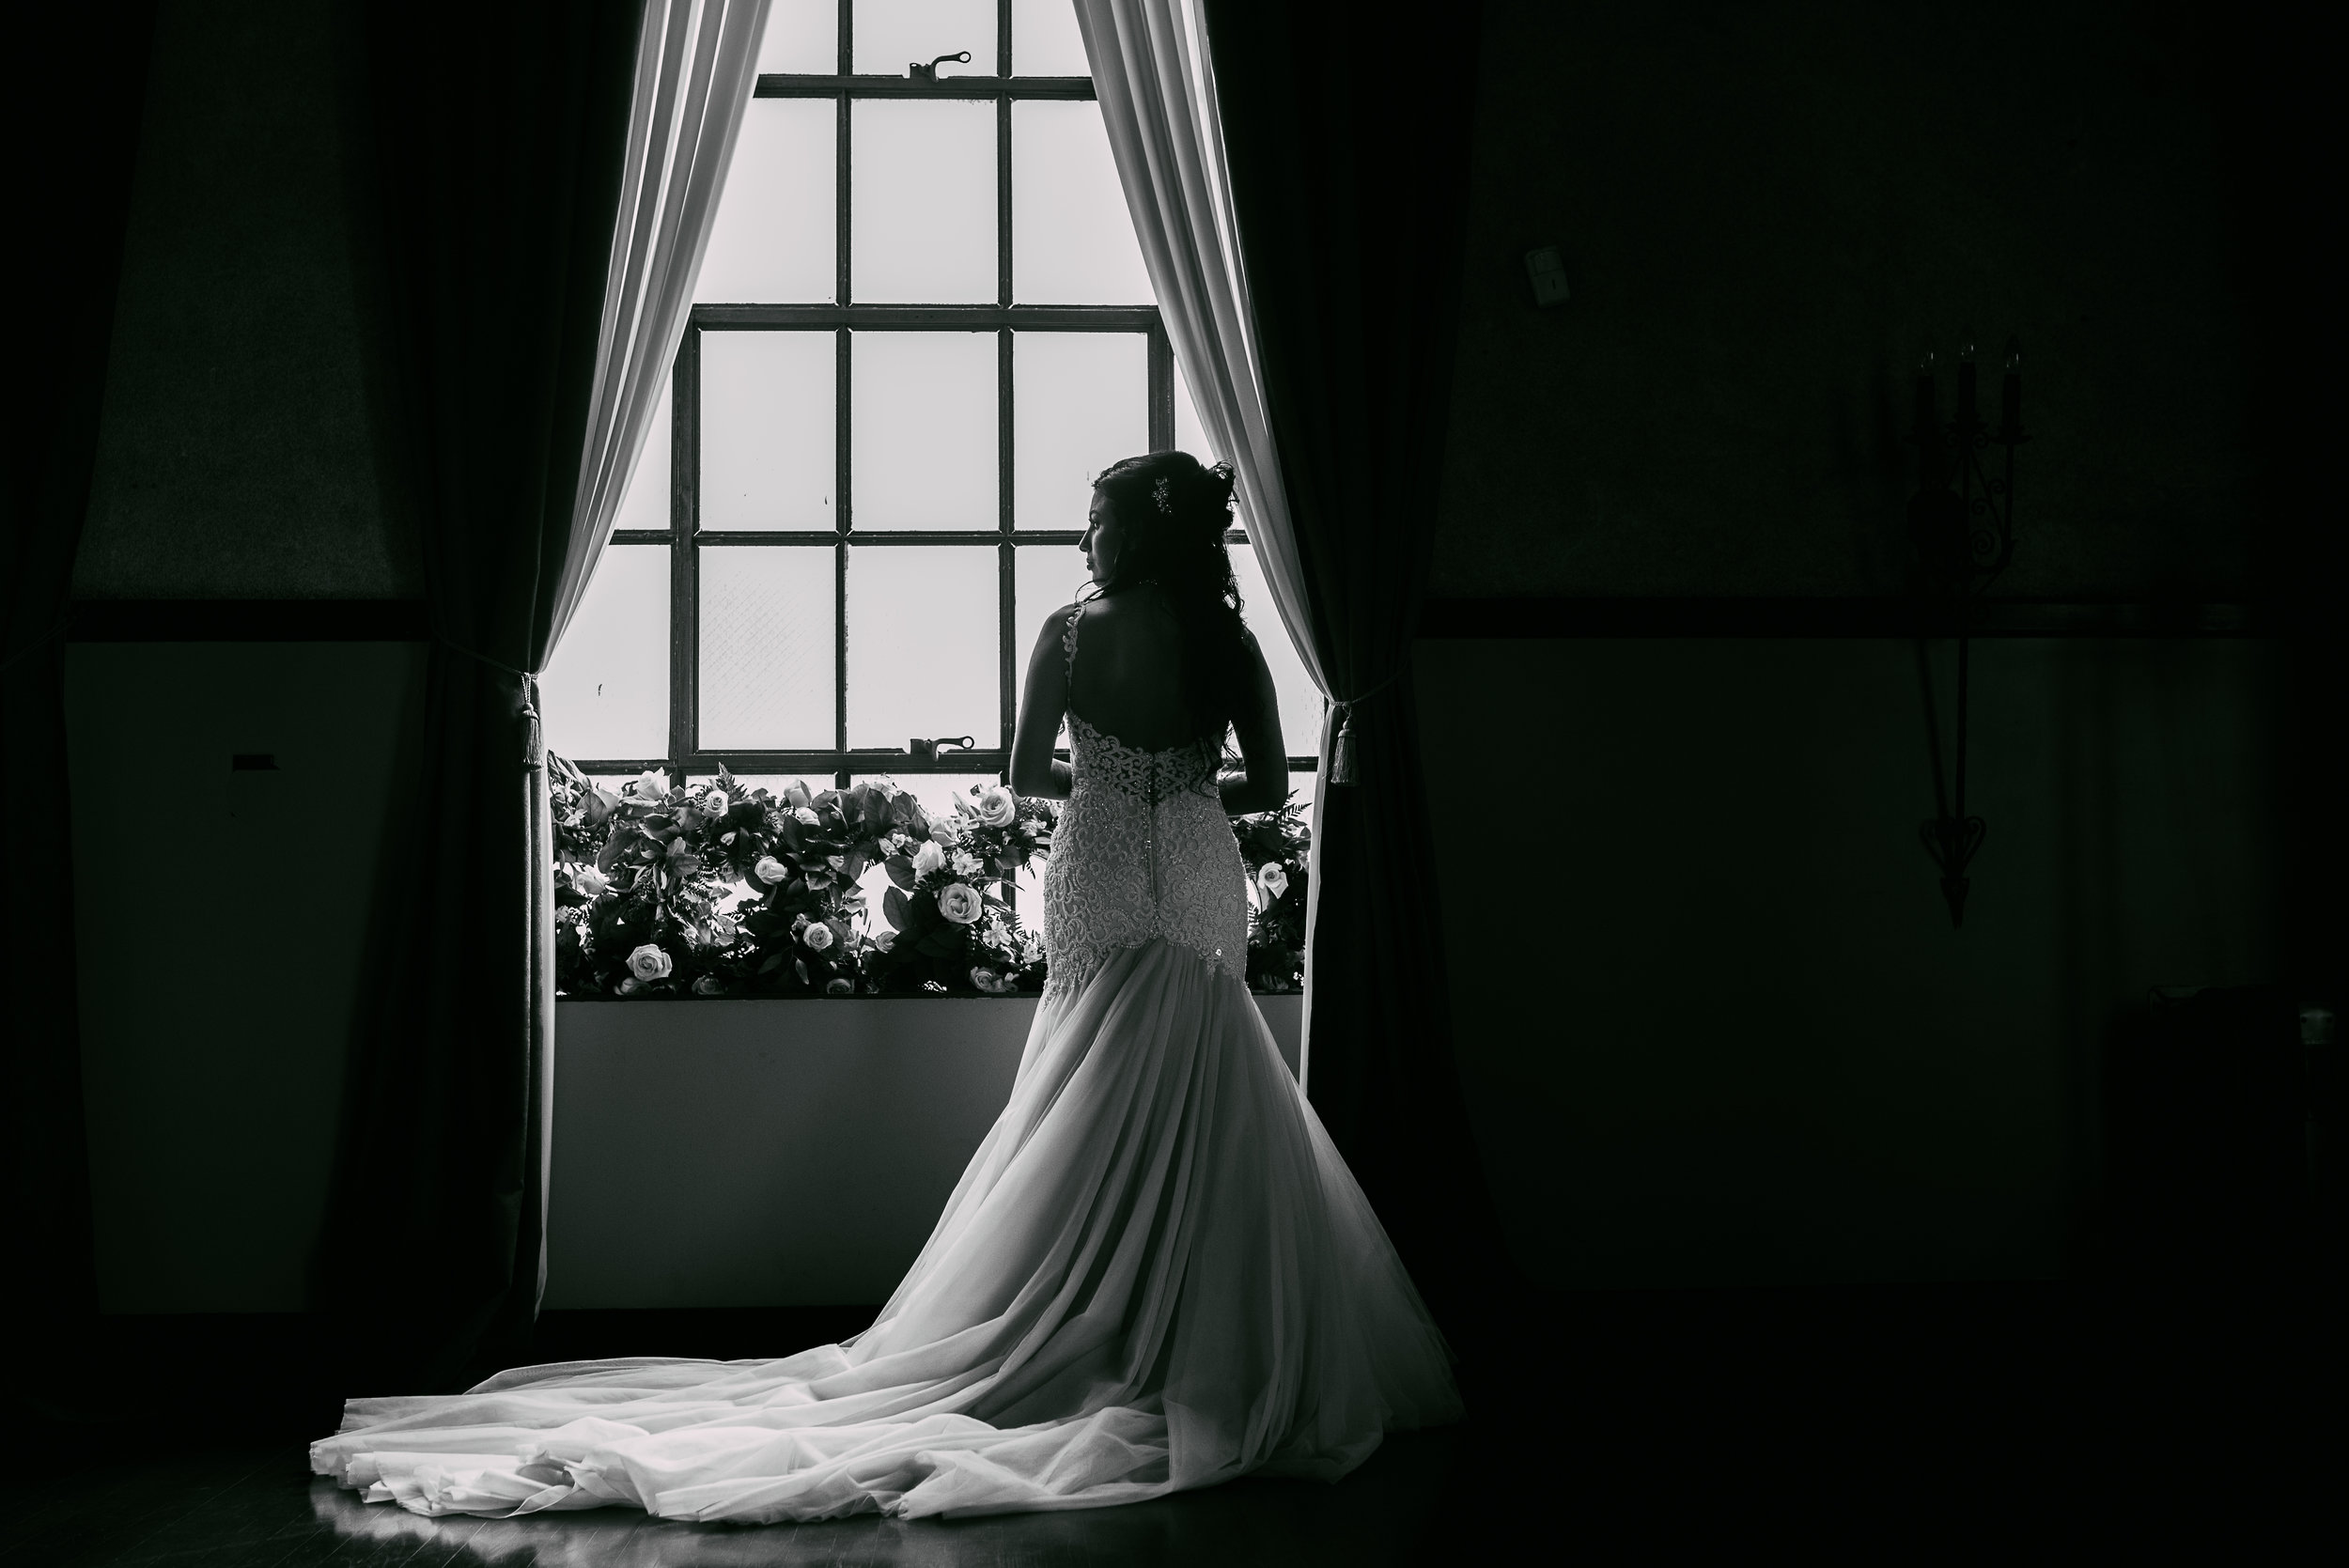 loft-84-riverside-maura-wedding-ceremony-21-14.jpg